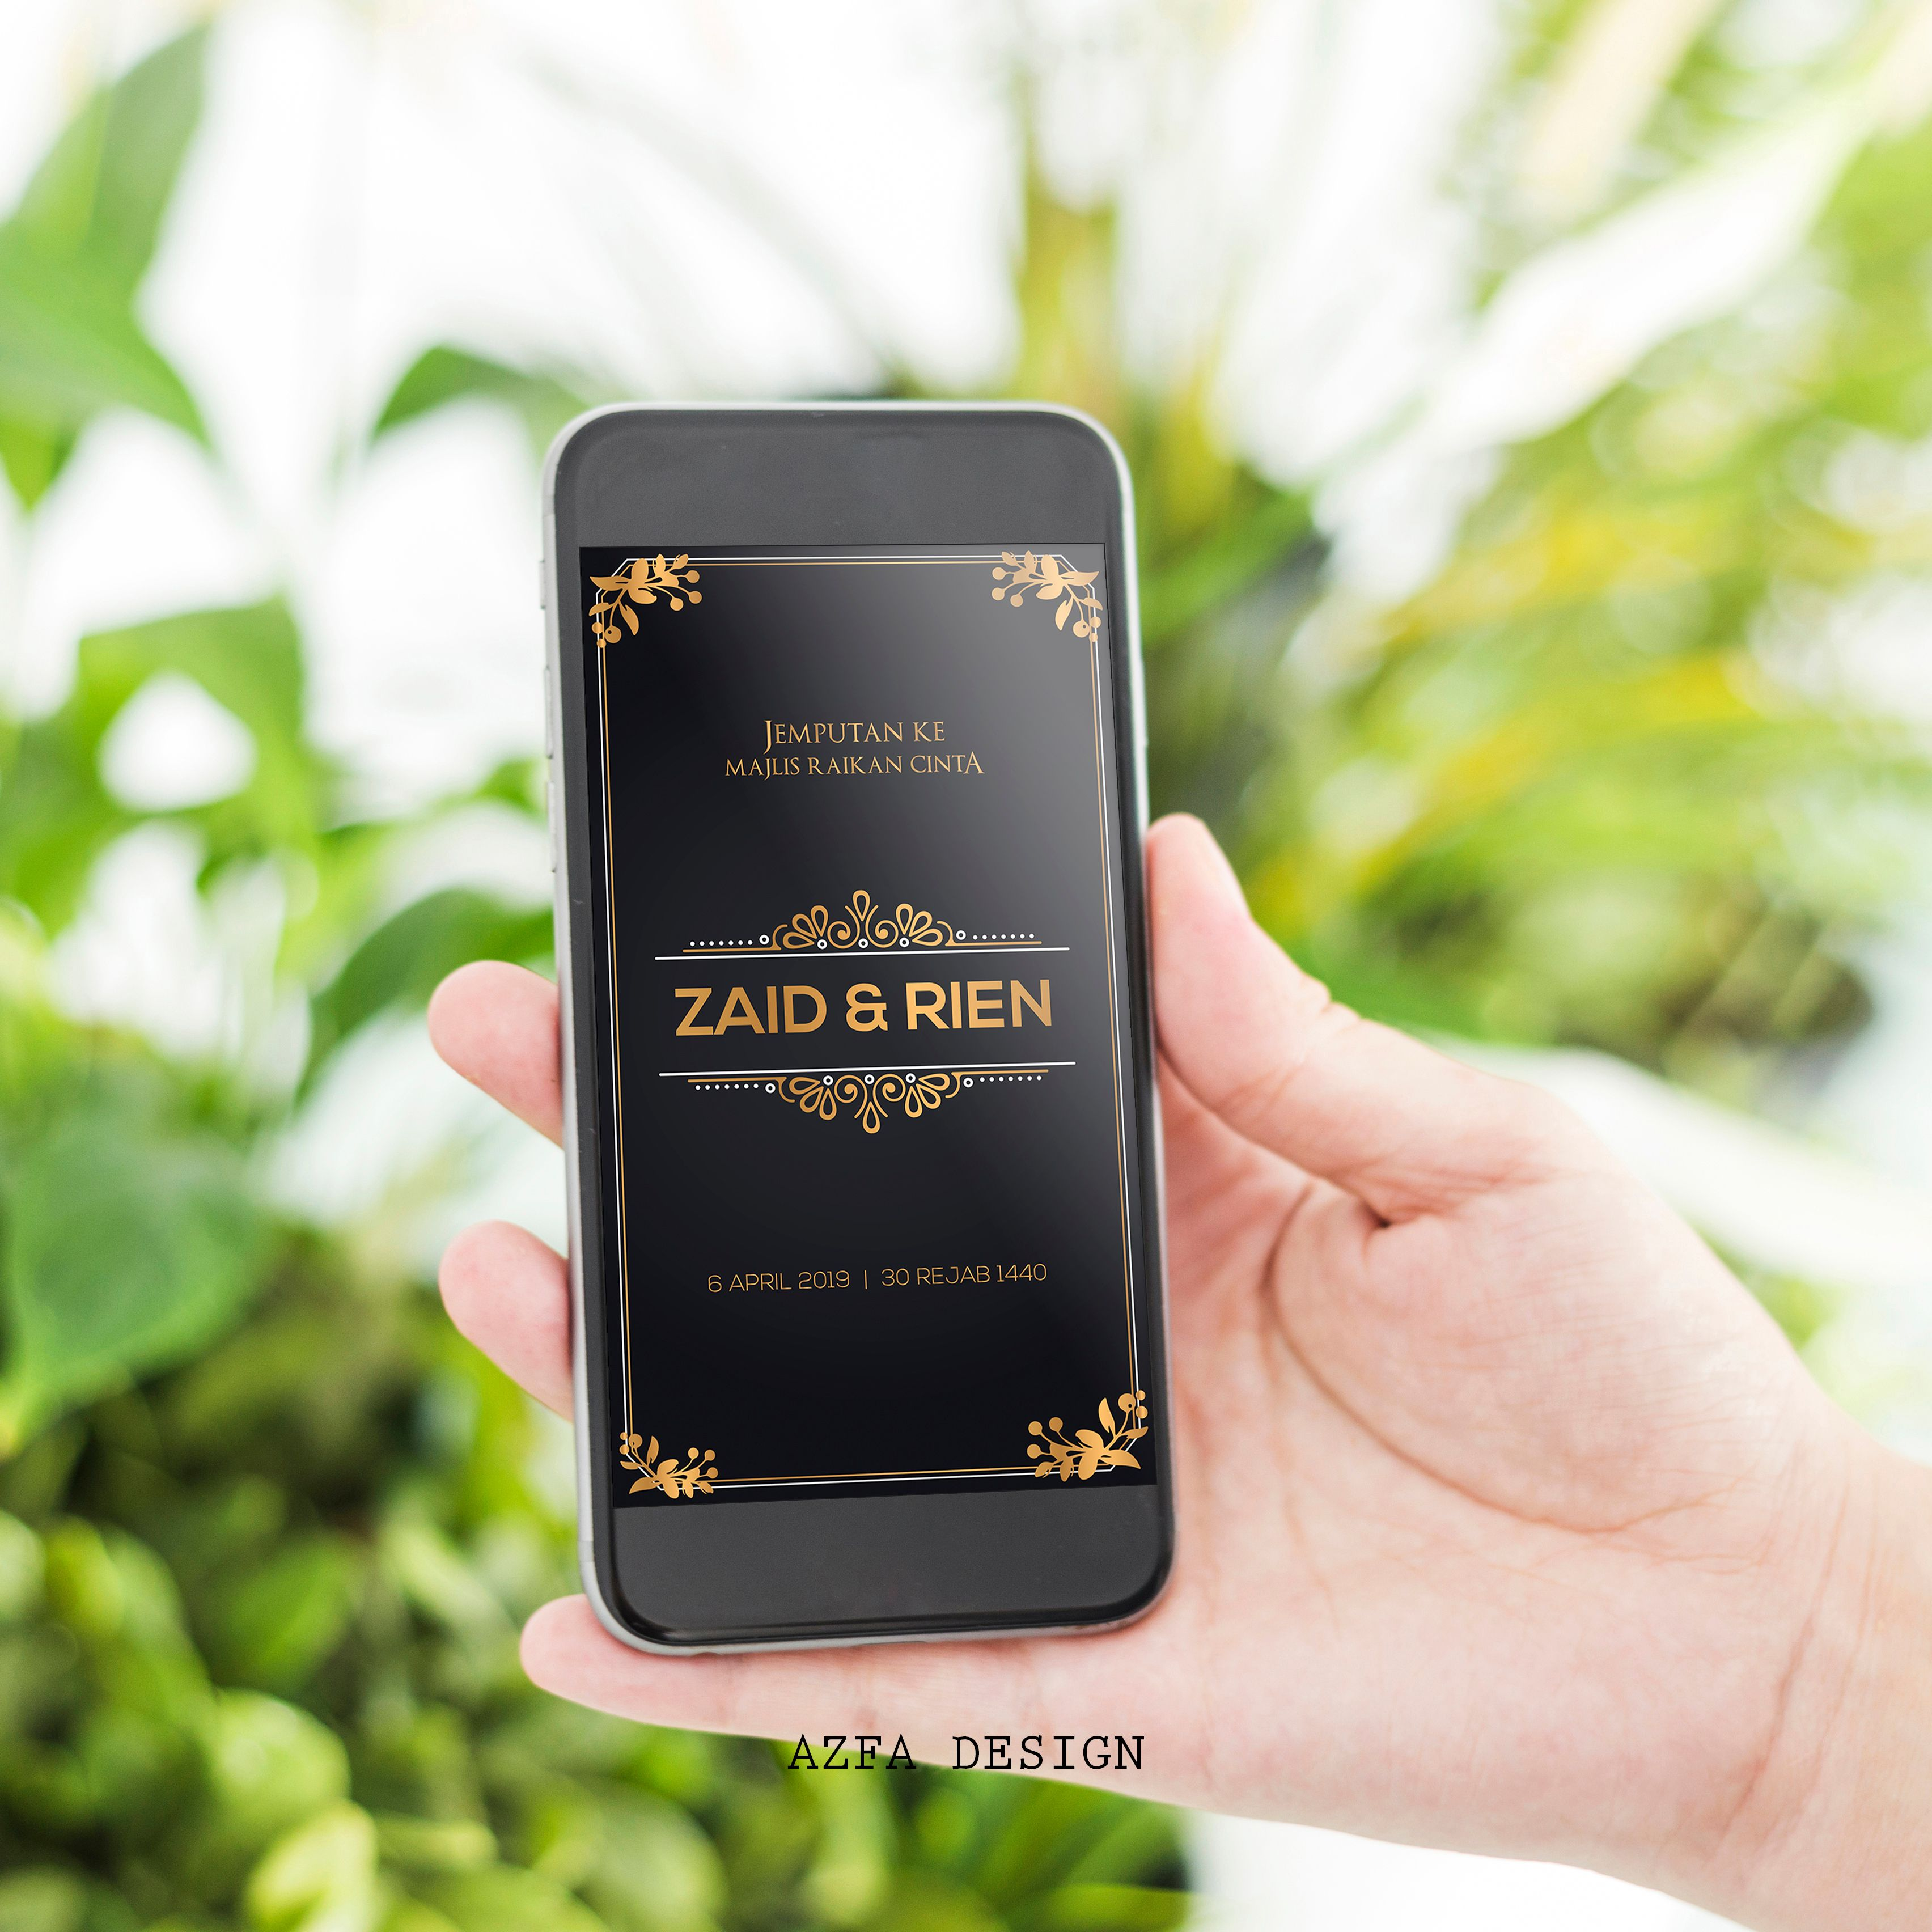 Azfadesign Kadkahwin Makin Simple Design Kad Kahwin Tu Makin Unik Sebenarnya Kan Bak Kata Oang Put Blackberry Phone Electronic Products Invitation Cards